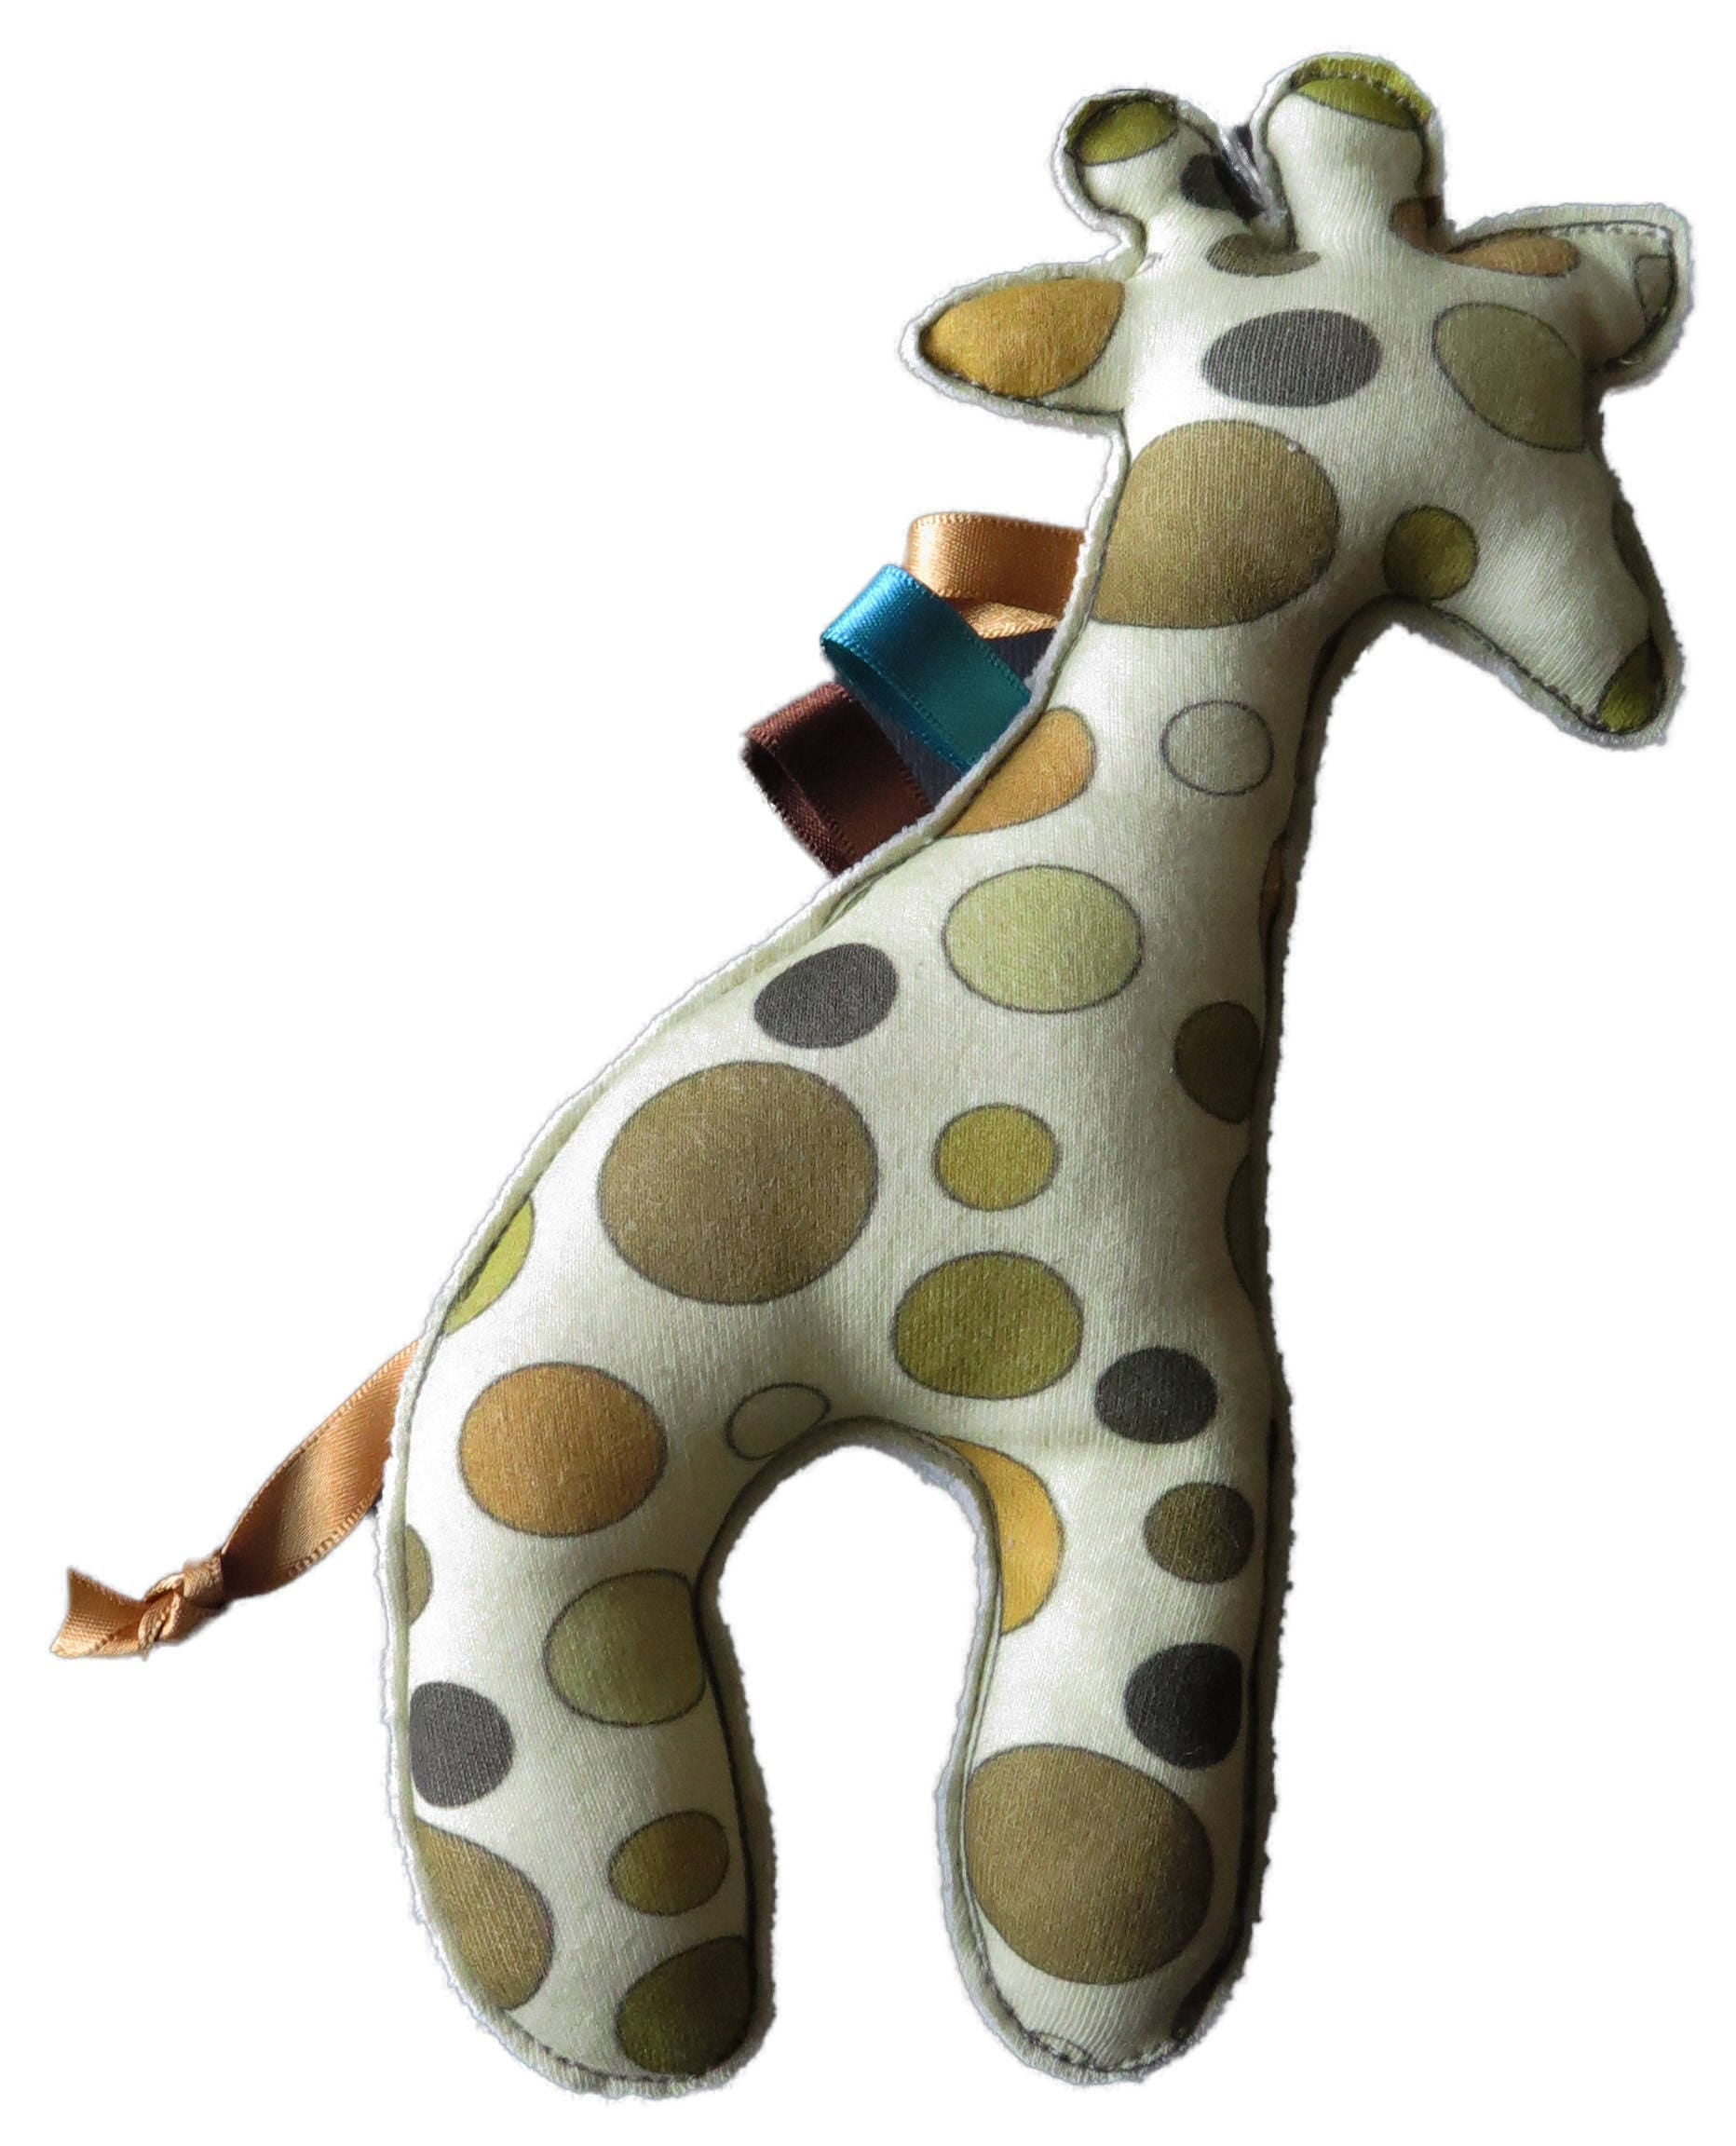 Animal Fid Toys Noah s Ark Tactile Toys Sensory Toys ADHD